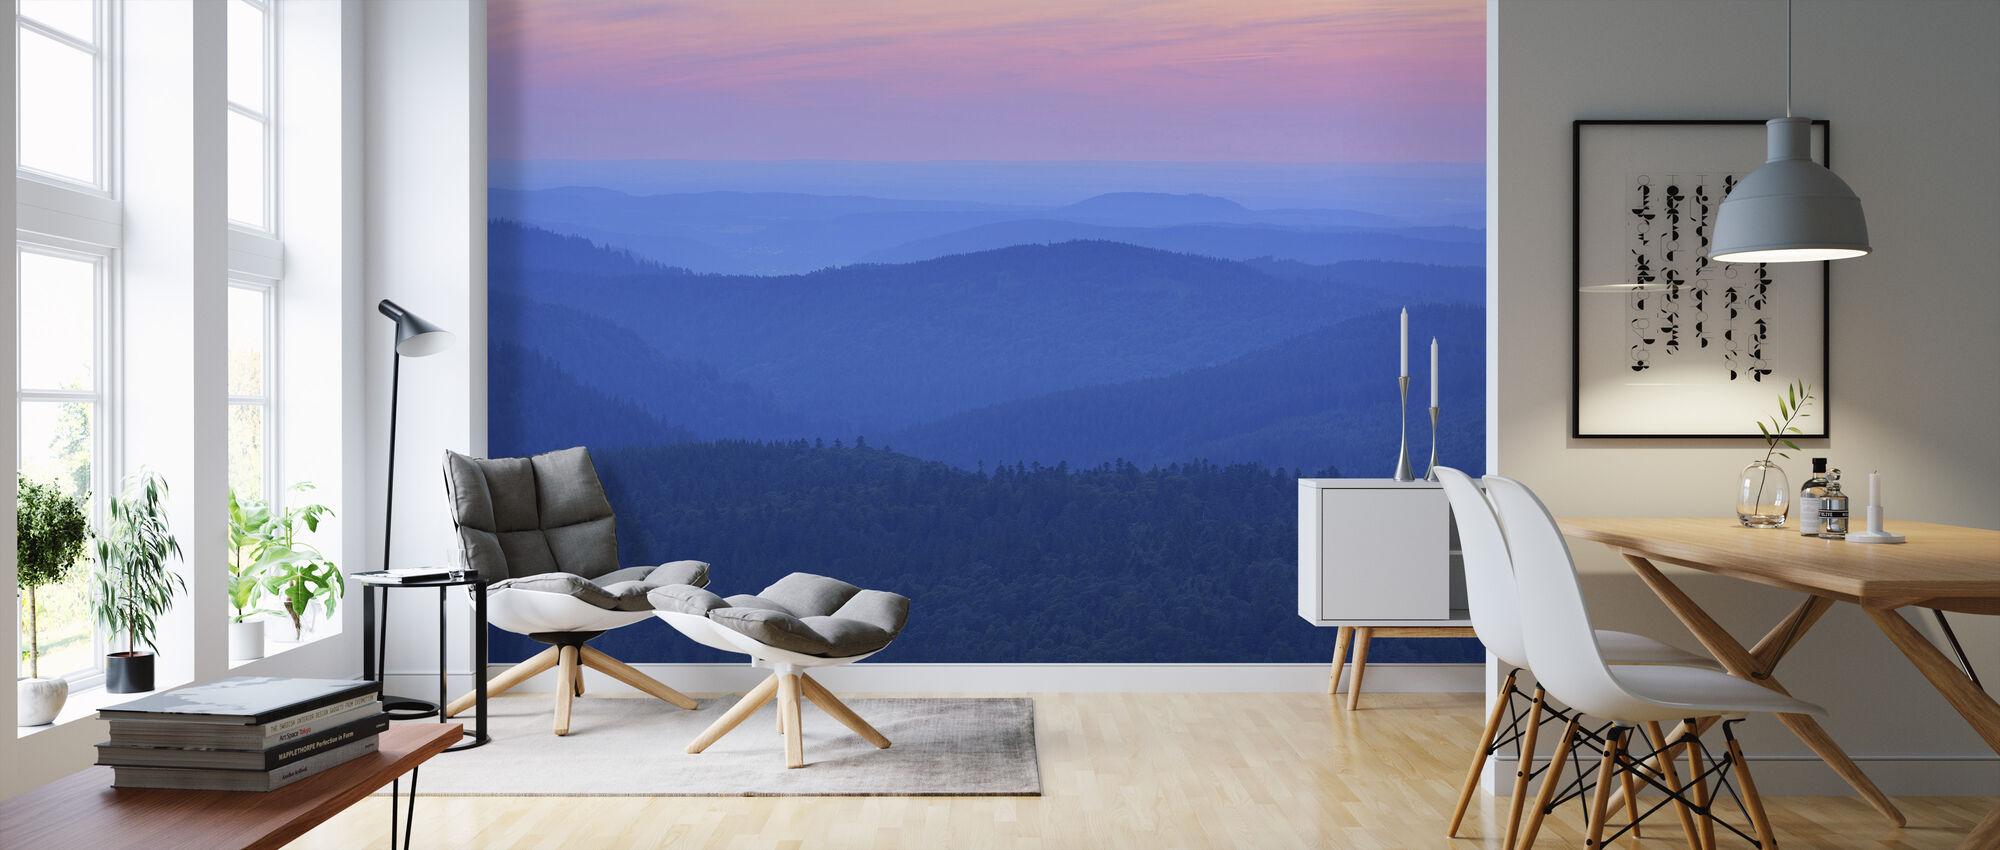 Dawn Ridges in the Evening - Wallpaper - Living Room